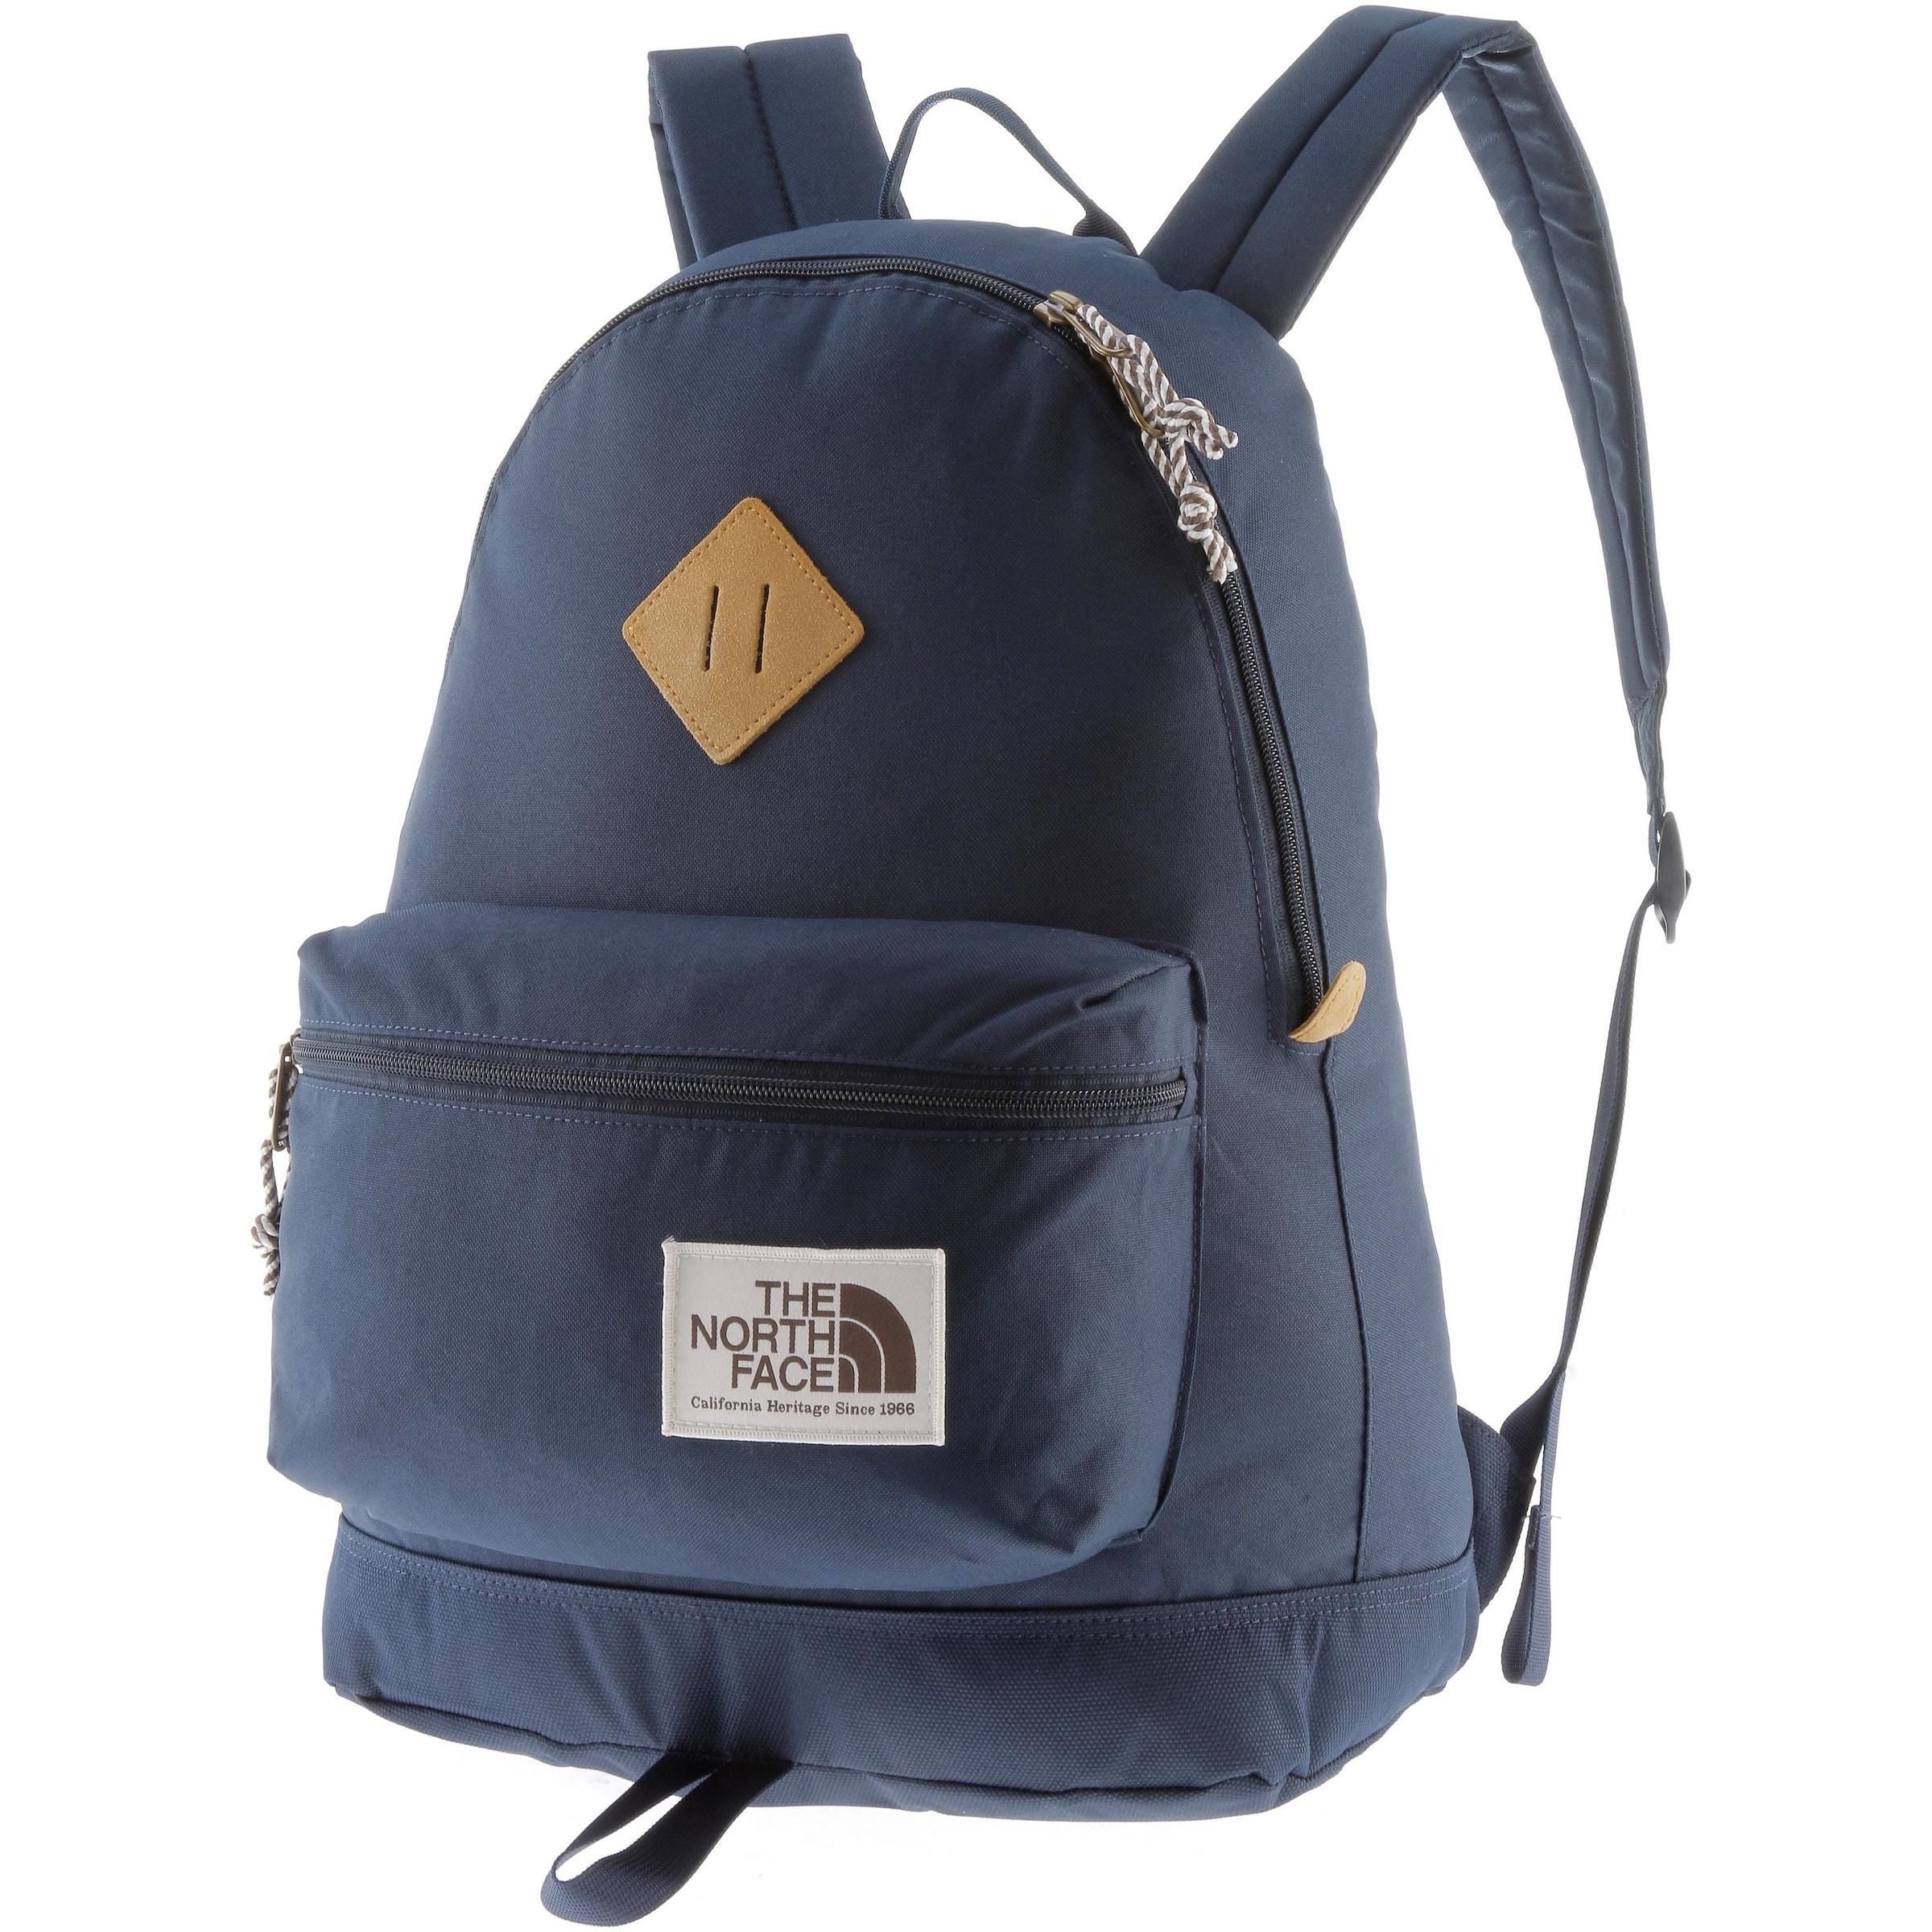 THE NORTH FACE 'BERKELEY' Daypack Fälschung Kt15a7UMS7